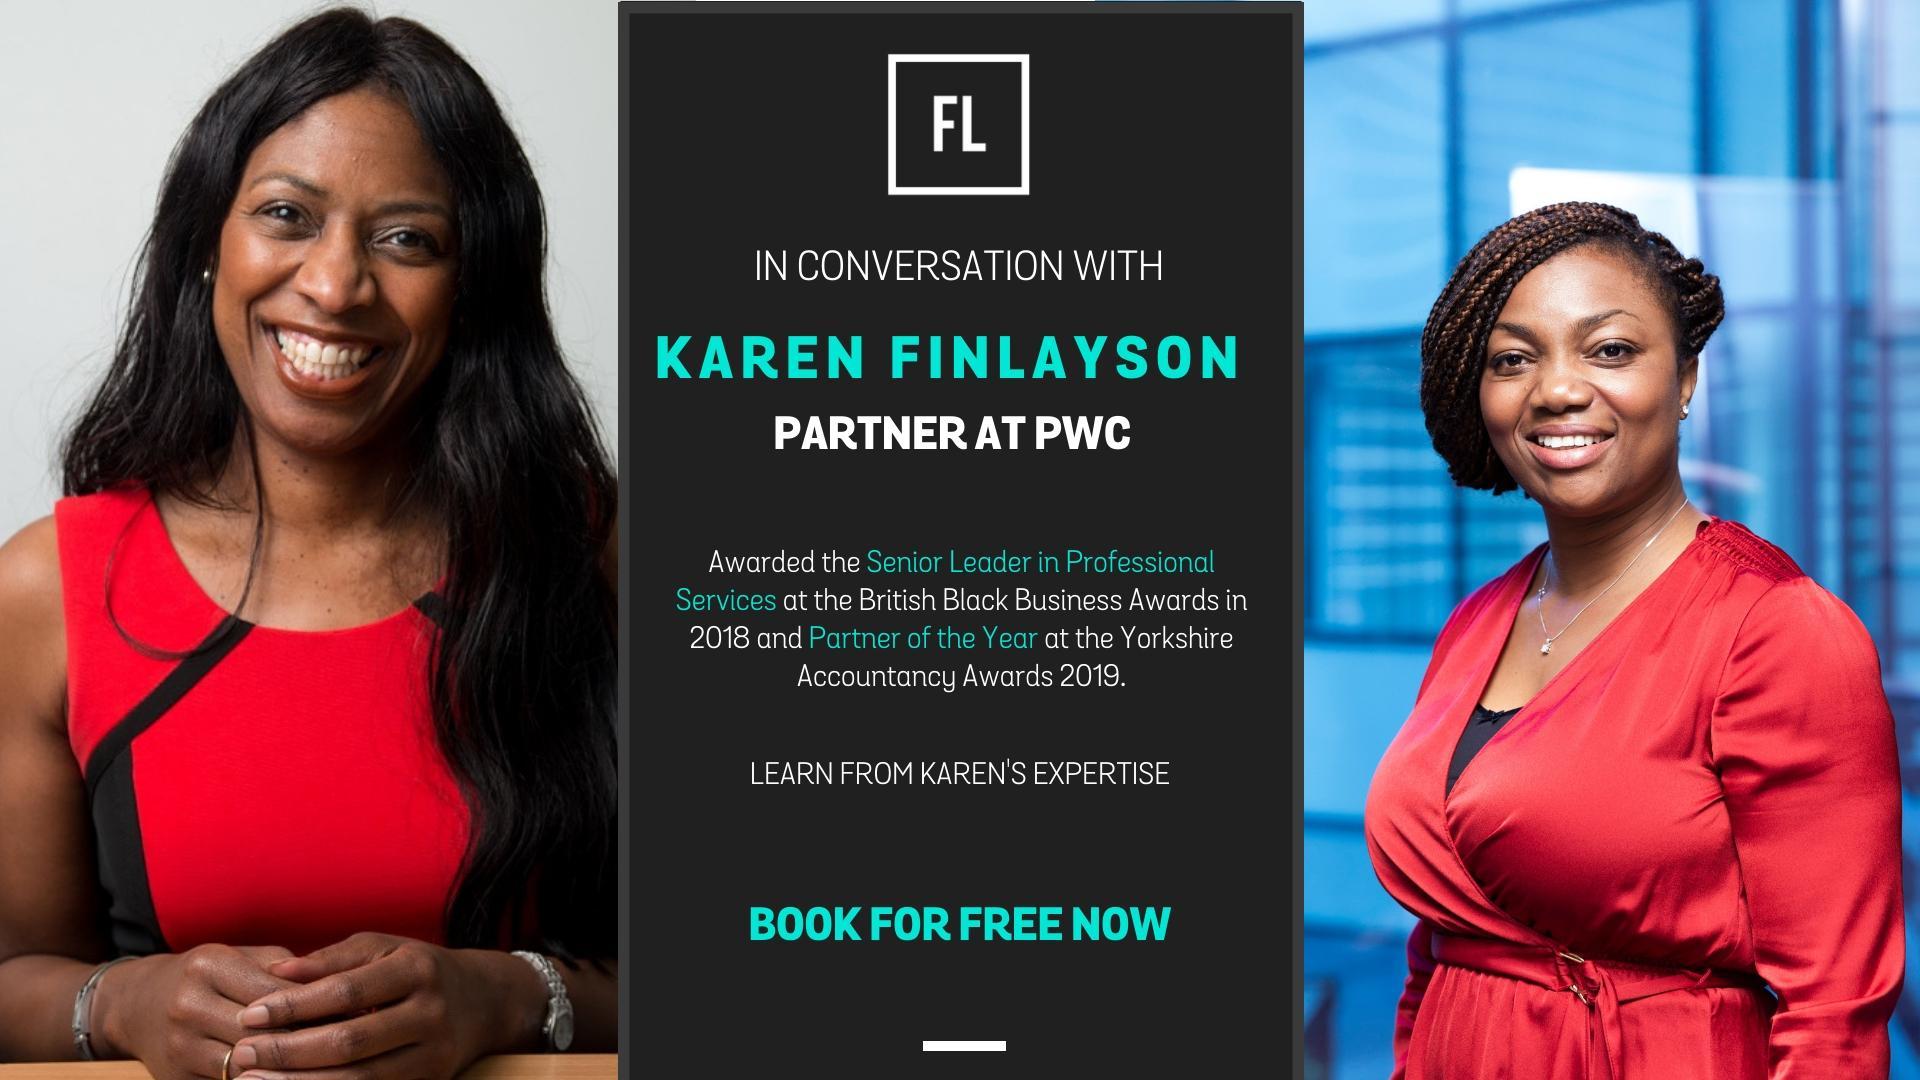 In Conversation With Karen Finlayson, How To Make Partner